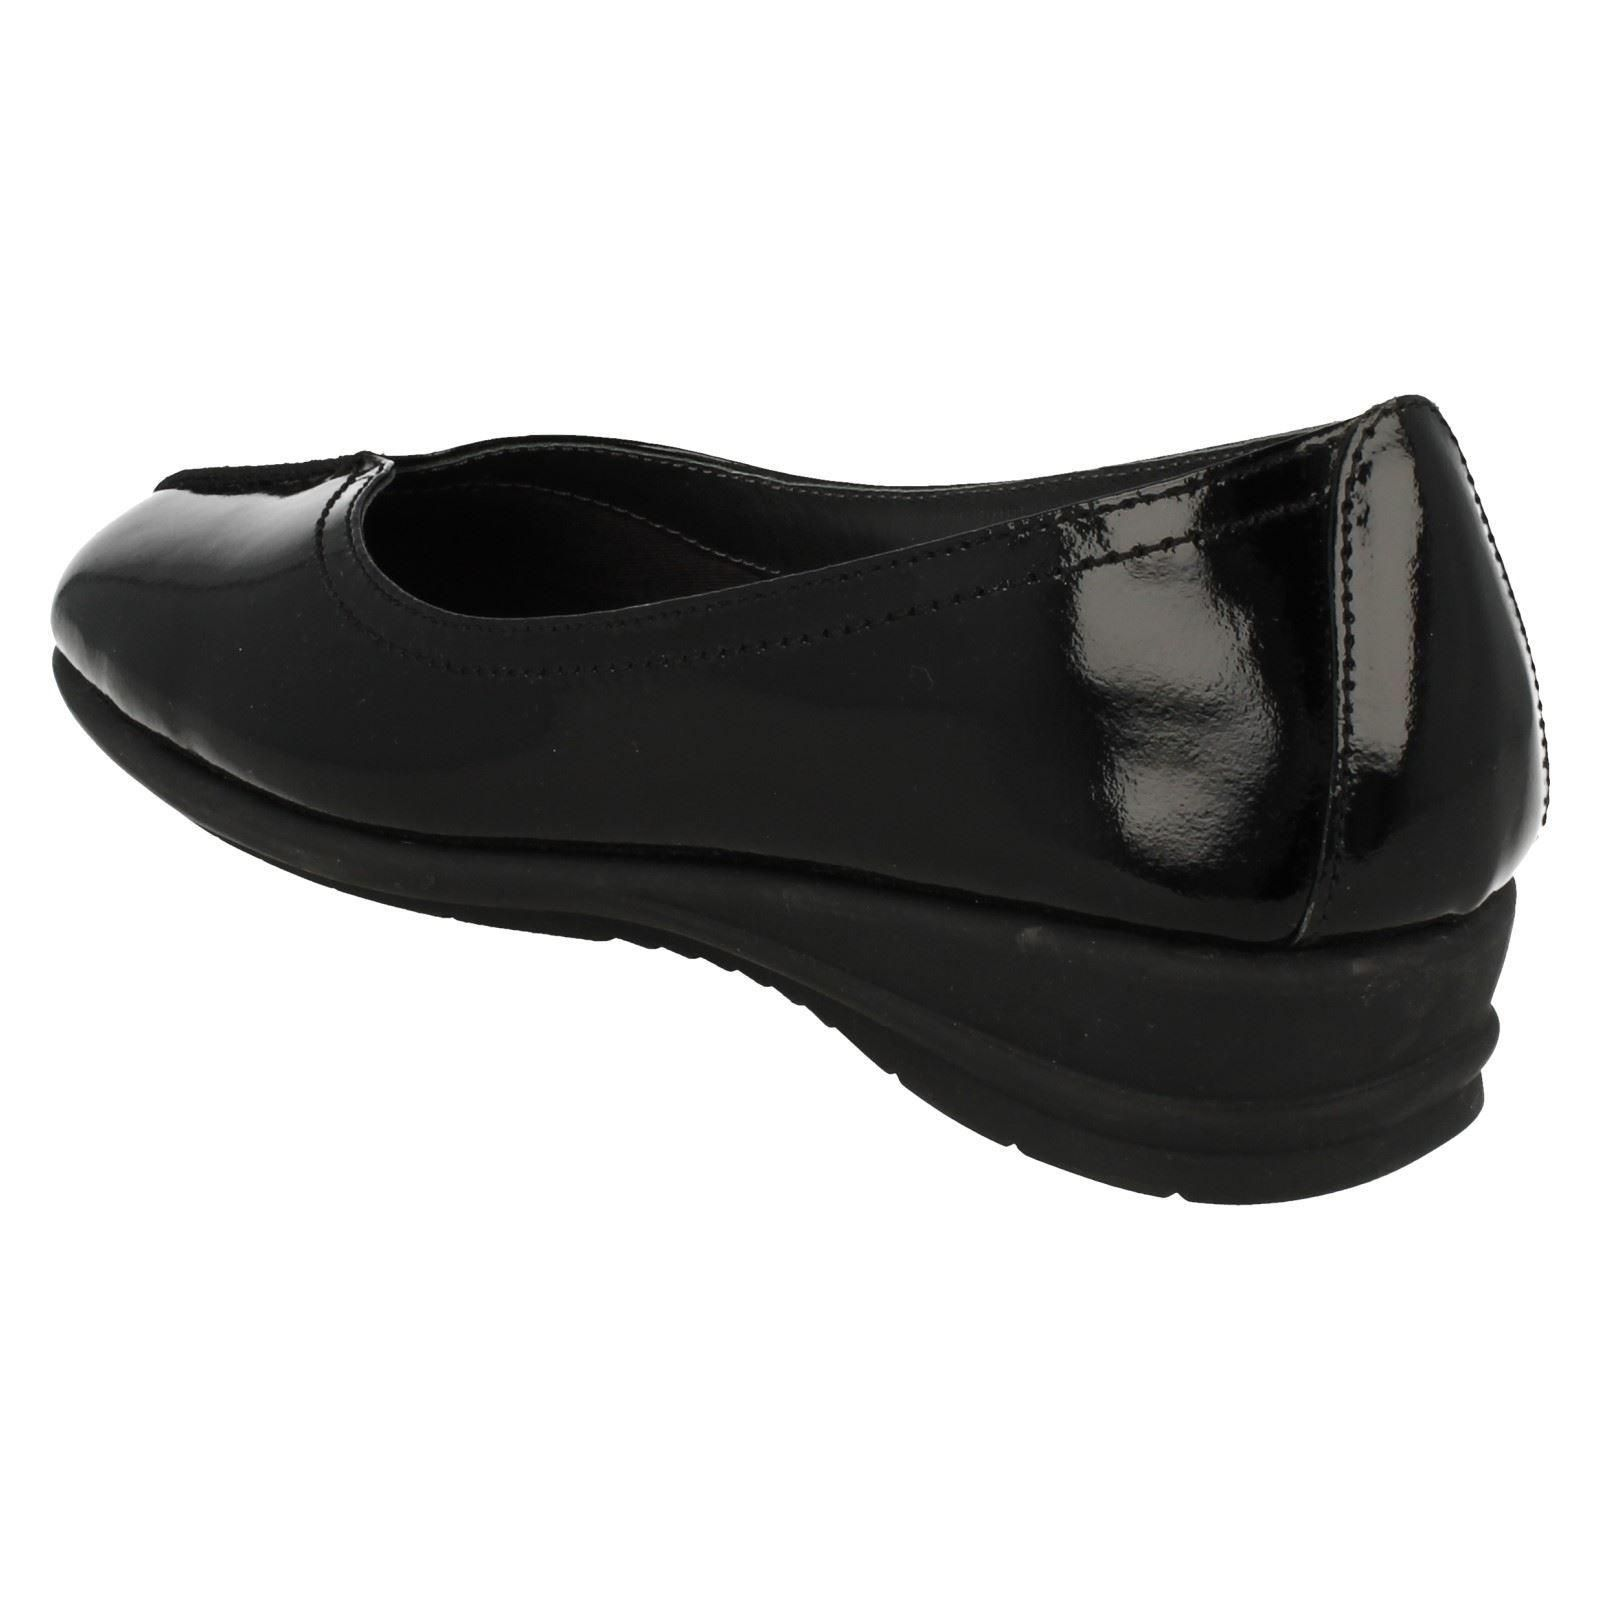 Low Smart Schwarz Damen Schuhe van Wedge 'falmouth' Dal PuOXiTwZk